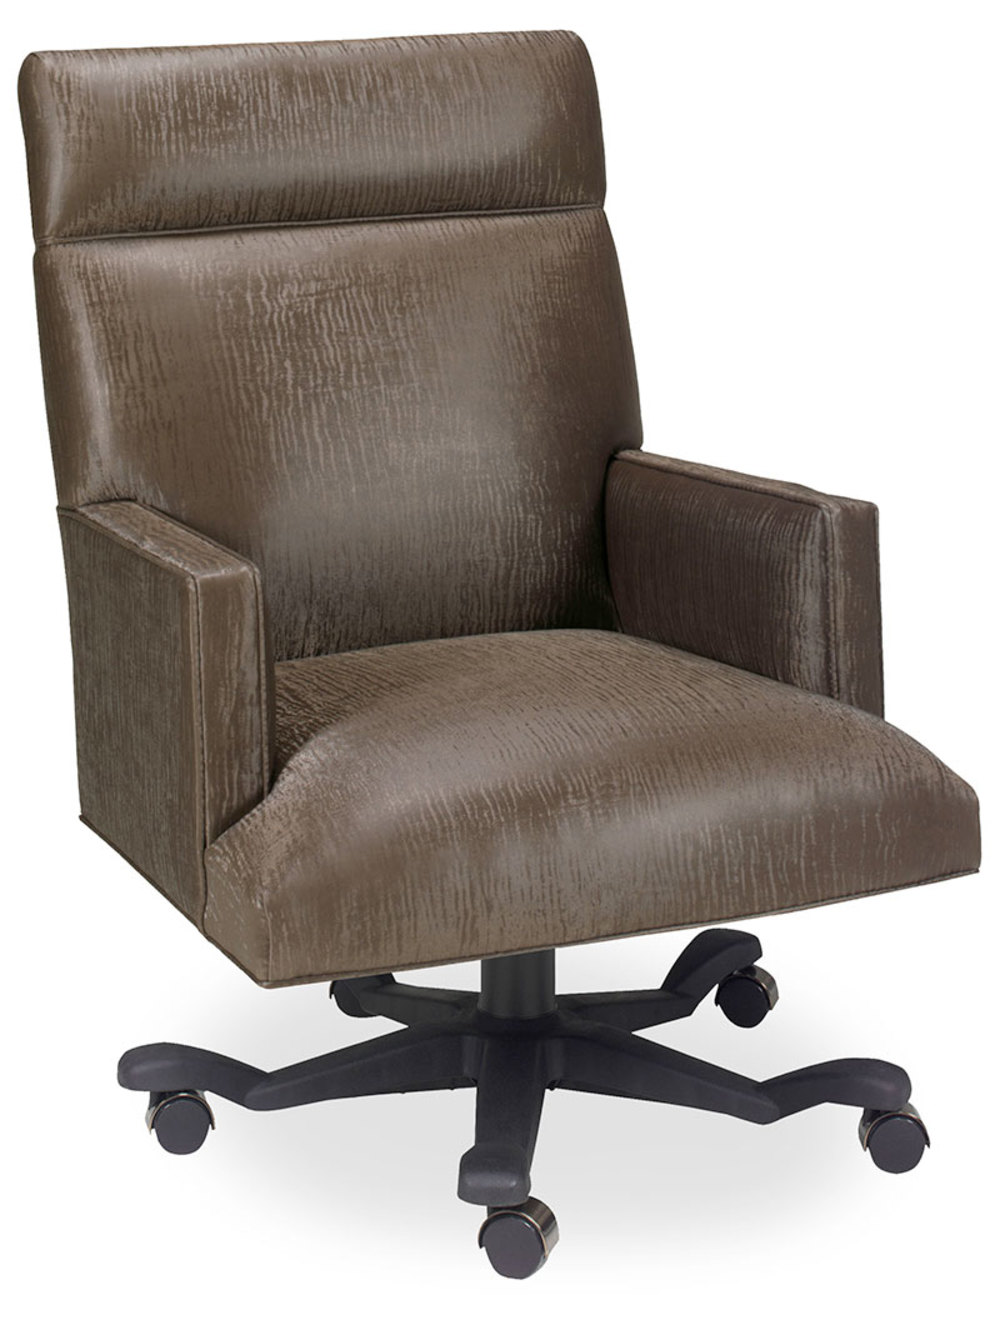 Parker Southern - Walsh Tilt Swivel Chair